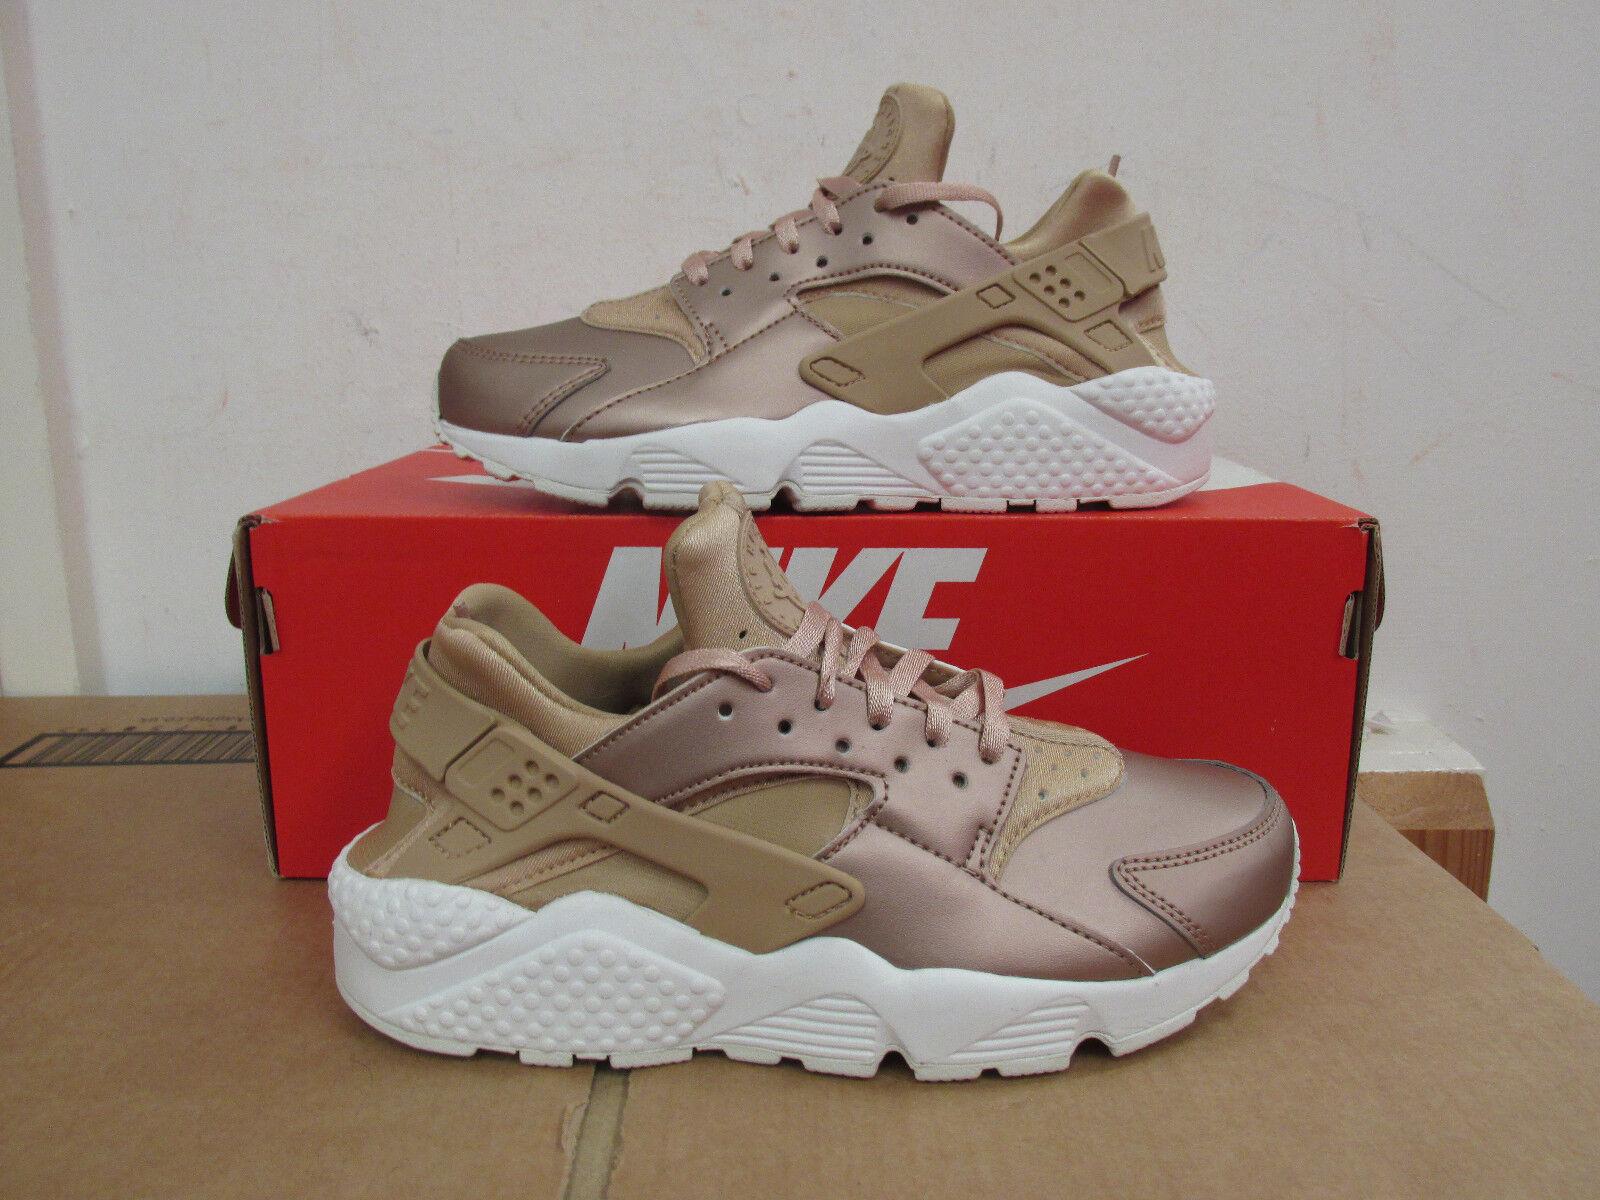 Nike air huarache correre donne prem txt donne correre aa0523 200 correndo formatori clearance 44496a